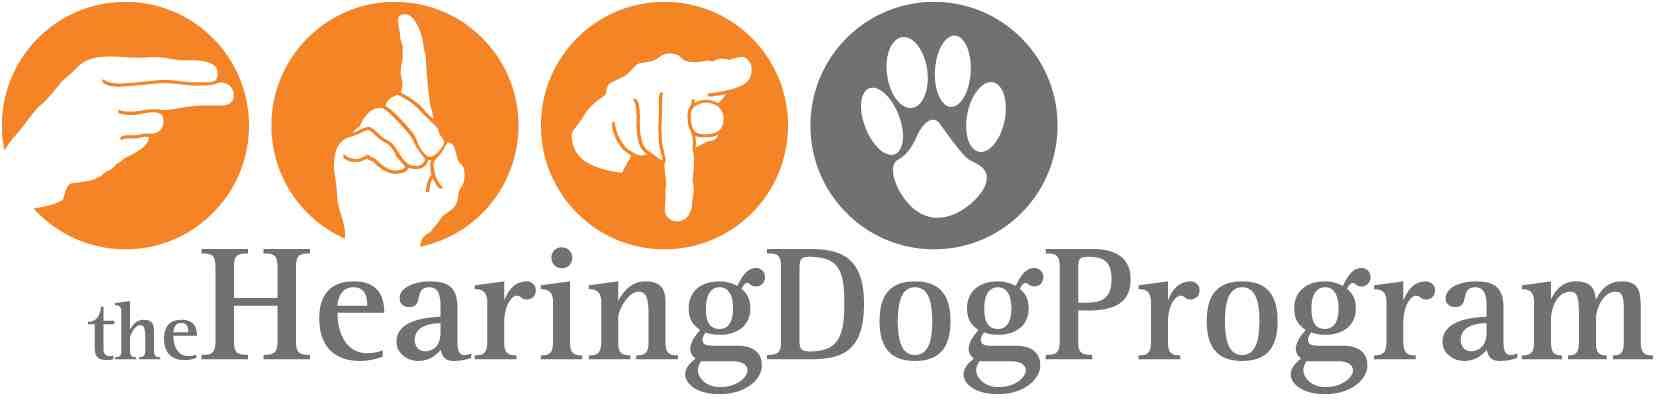 hearing dog program